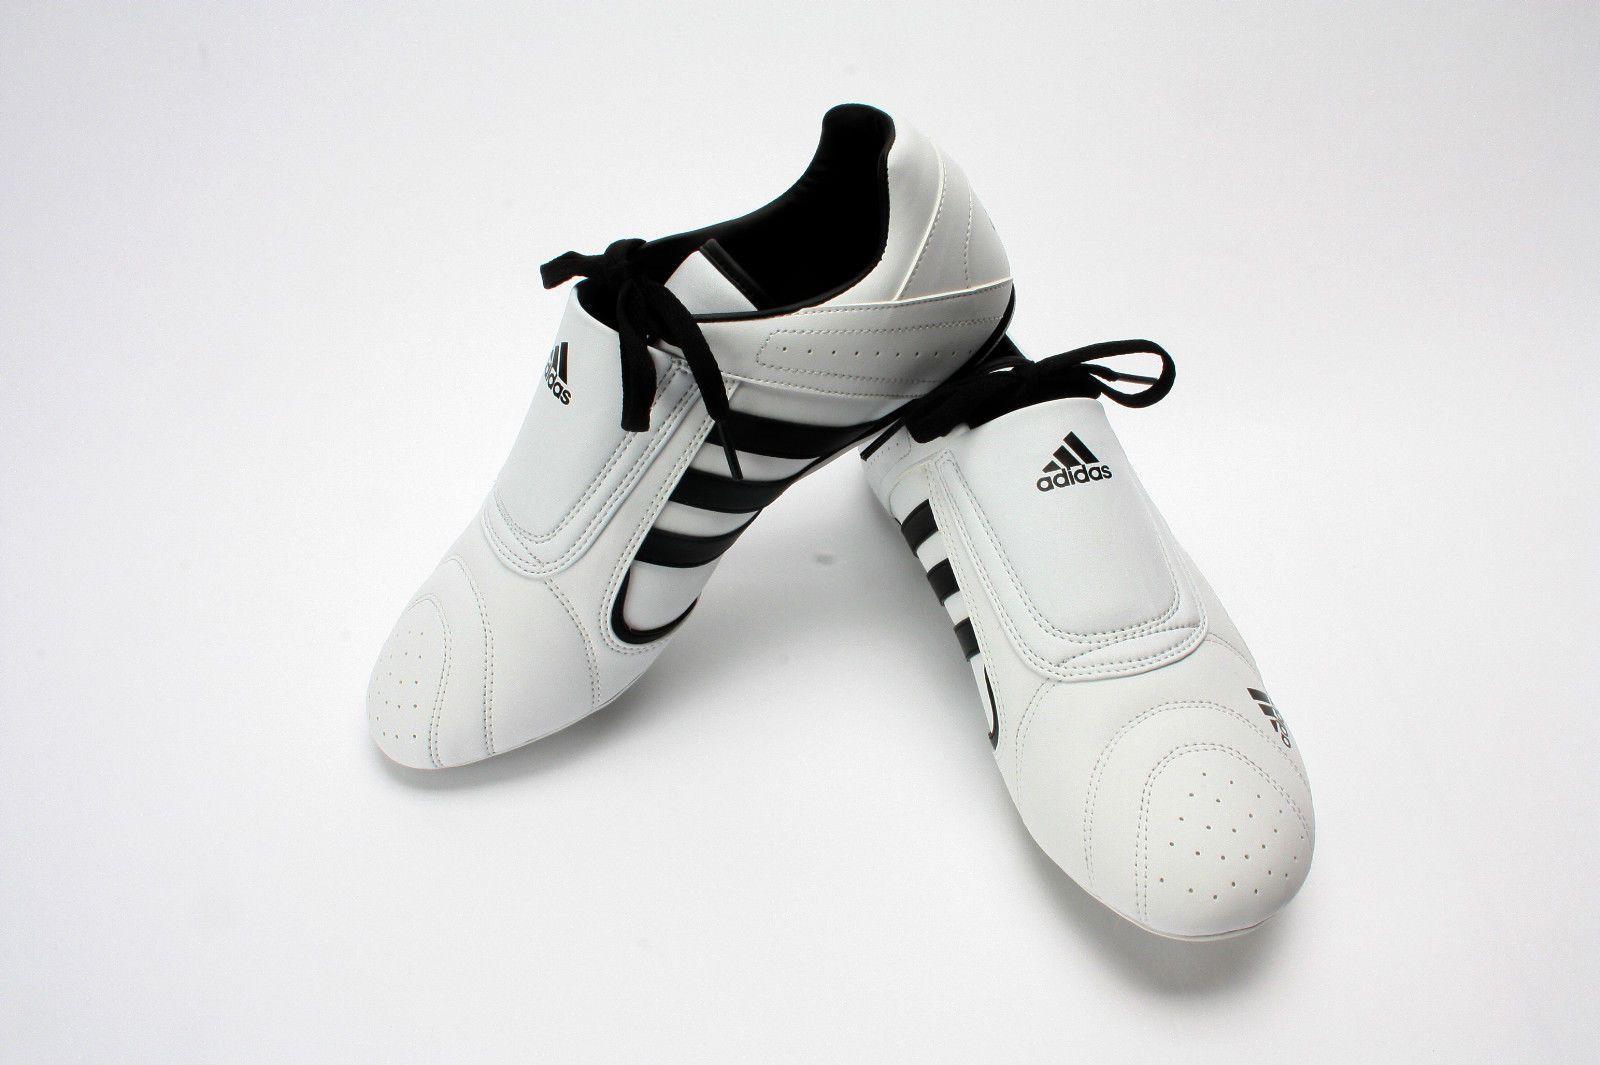 Adidas 3 Taekwondo Scarpe / Sm 3 Adidas / Addidas Tkd Scarpe / Hapkido / Karatedo cc29c4